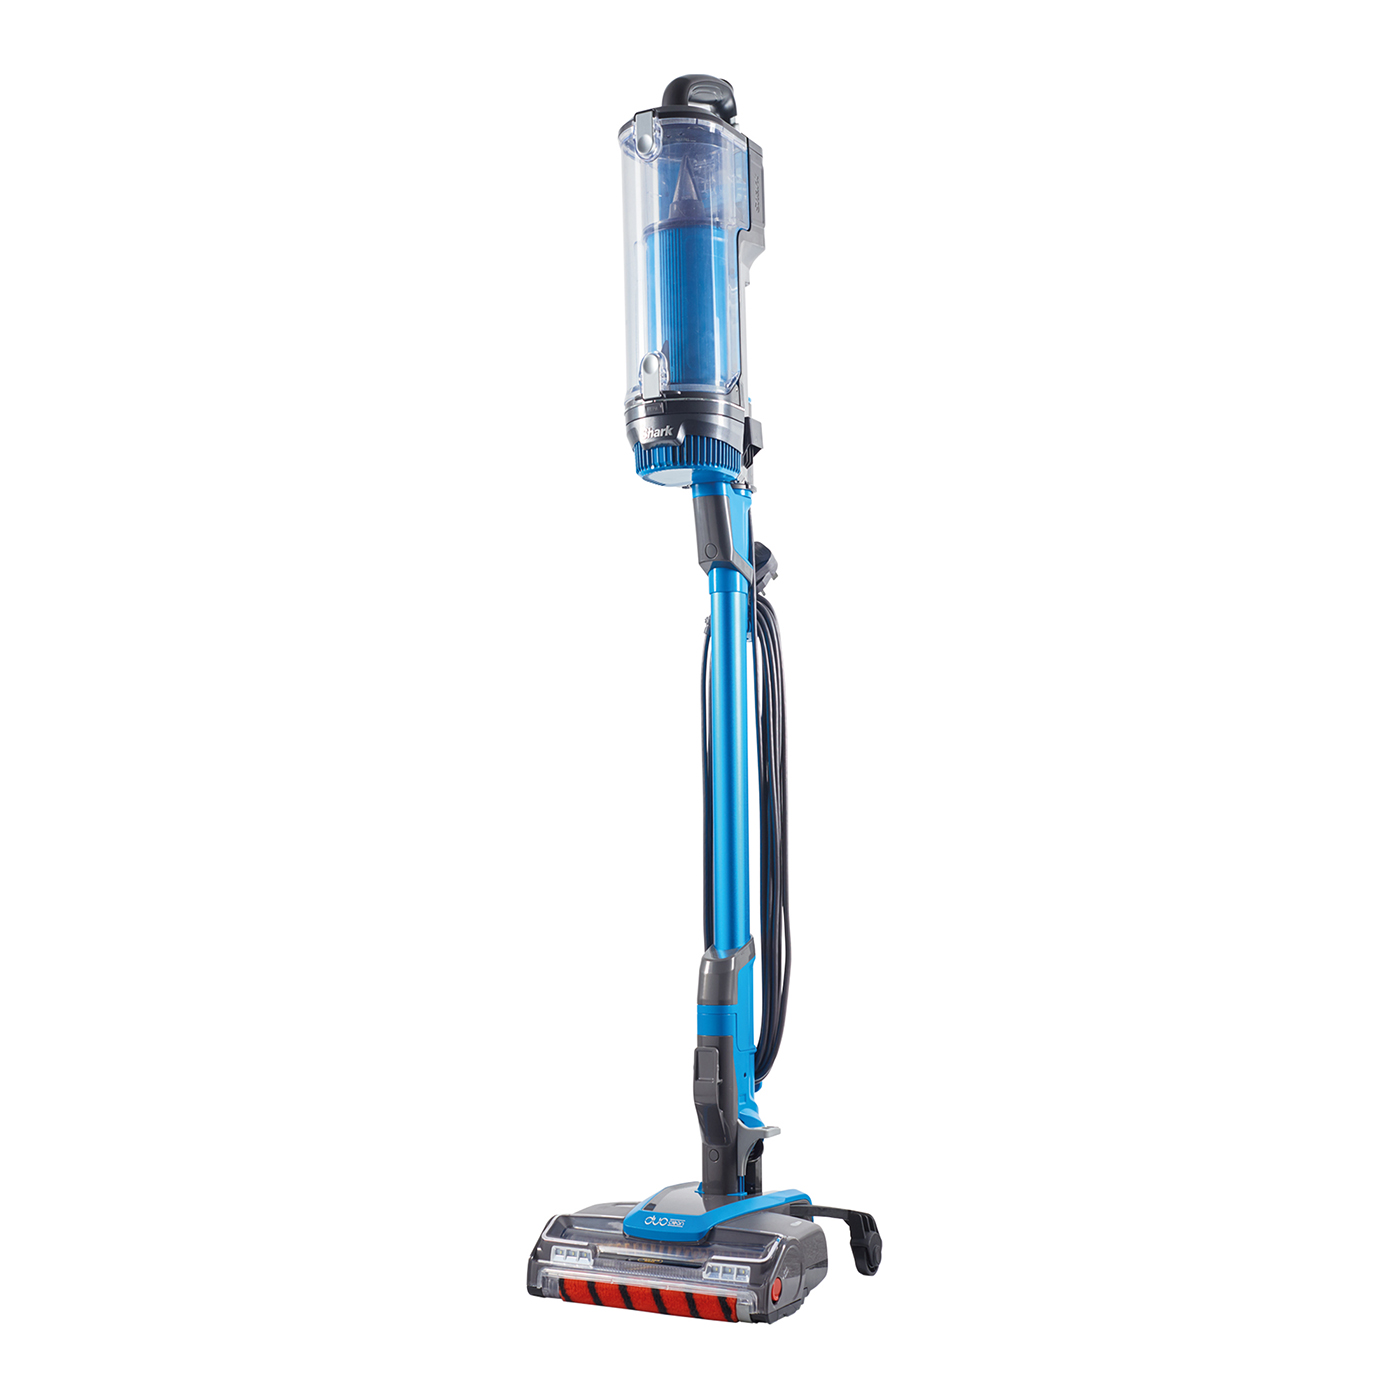 Shark Anti Hair Wrap Corded Stick Vacuum Cleaner, Pet Model HZ400UKT